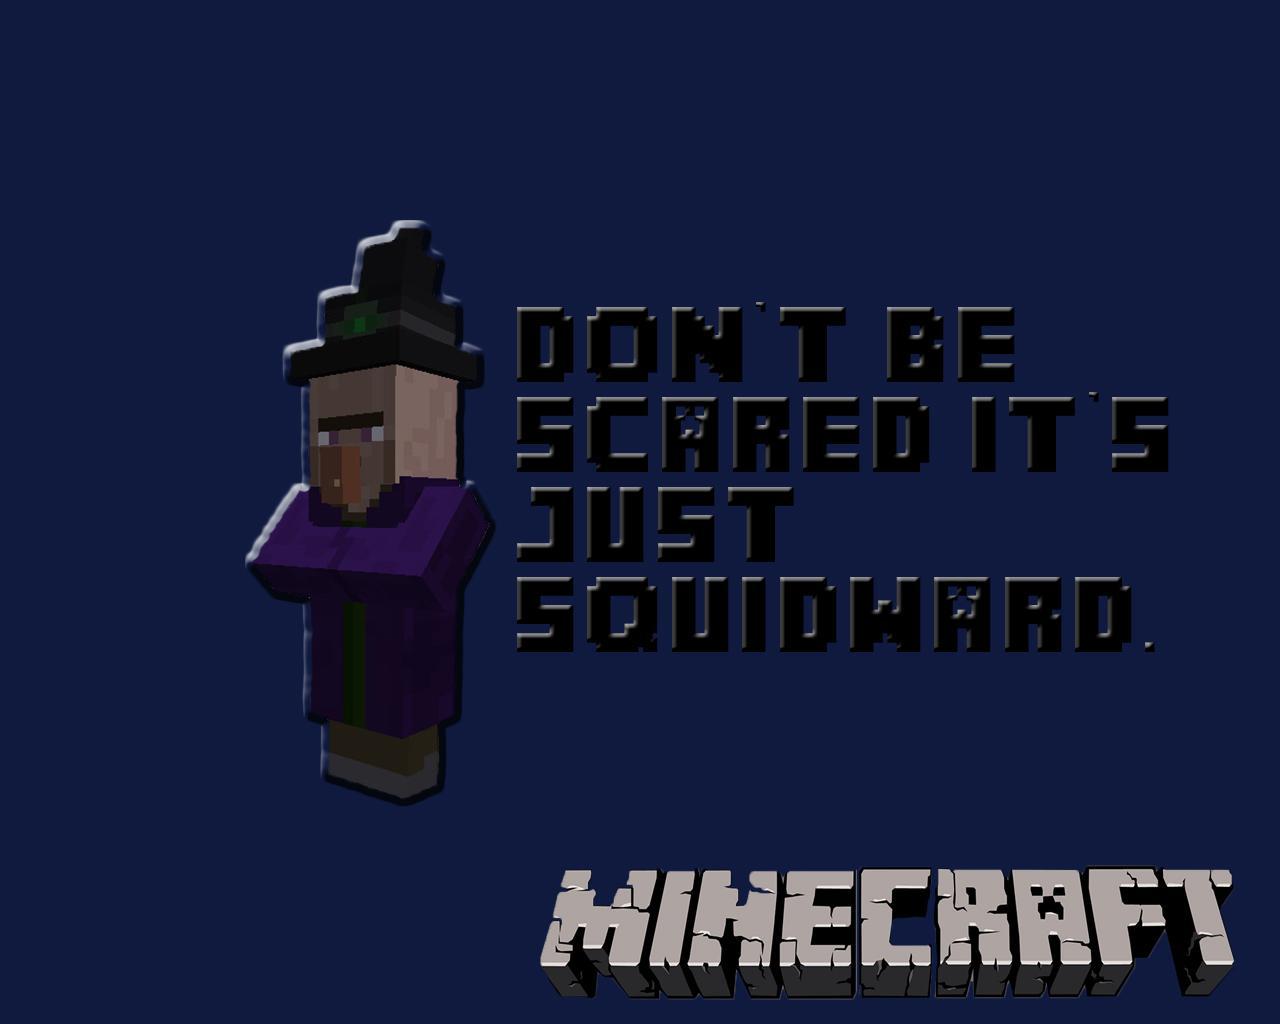 Must see Wallpaper Minecraft Halloween - Halloween-Wallpaper_3983783_lrg  You Should Have_45430.jpg